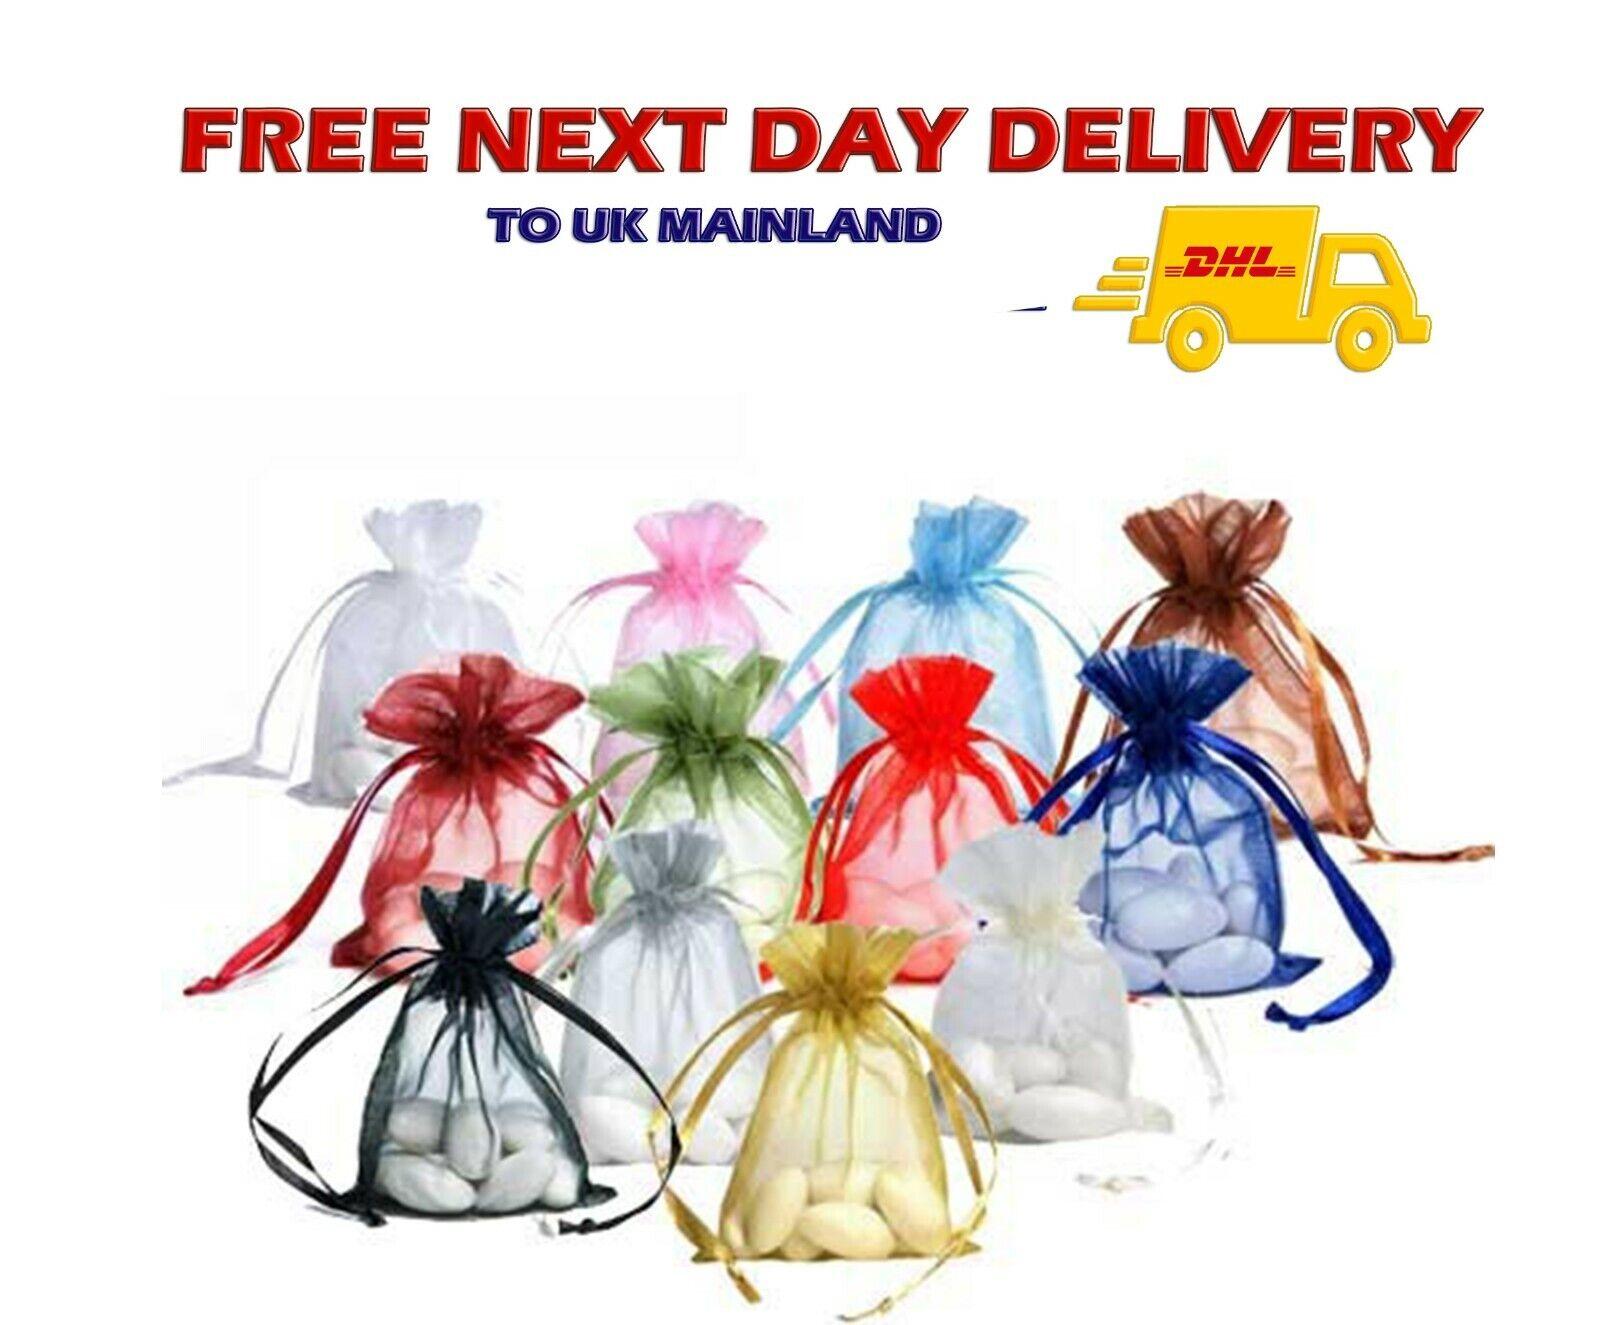 1000 Premium 14cm x 10cm ORGANZA GIFT BAGS Jewellery Pouch Xmas Wedding Favours